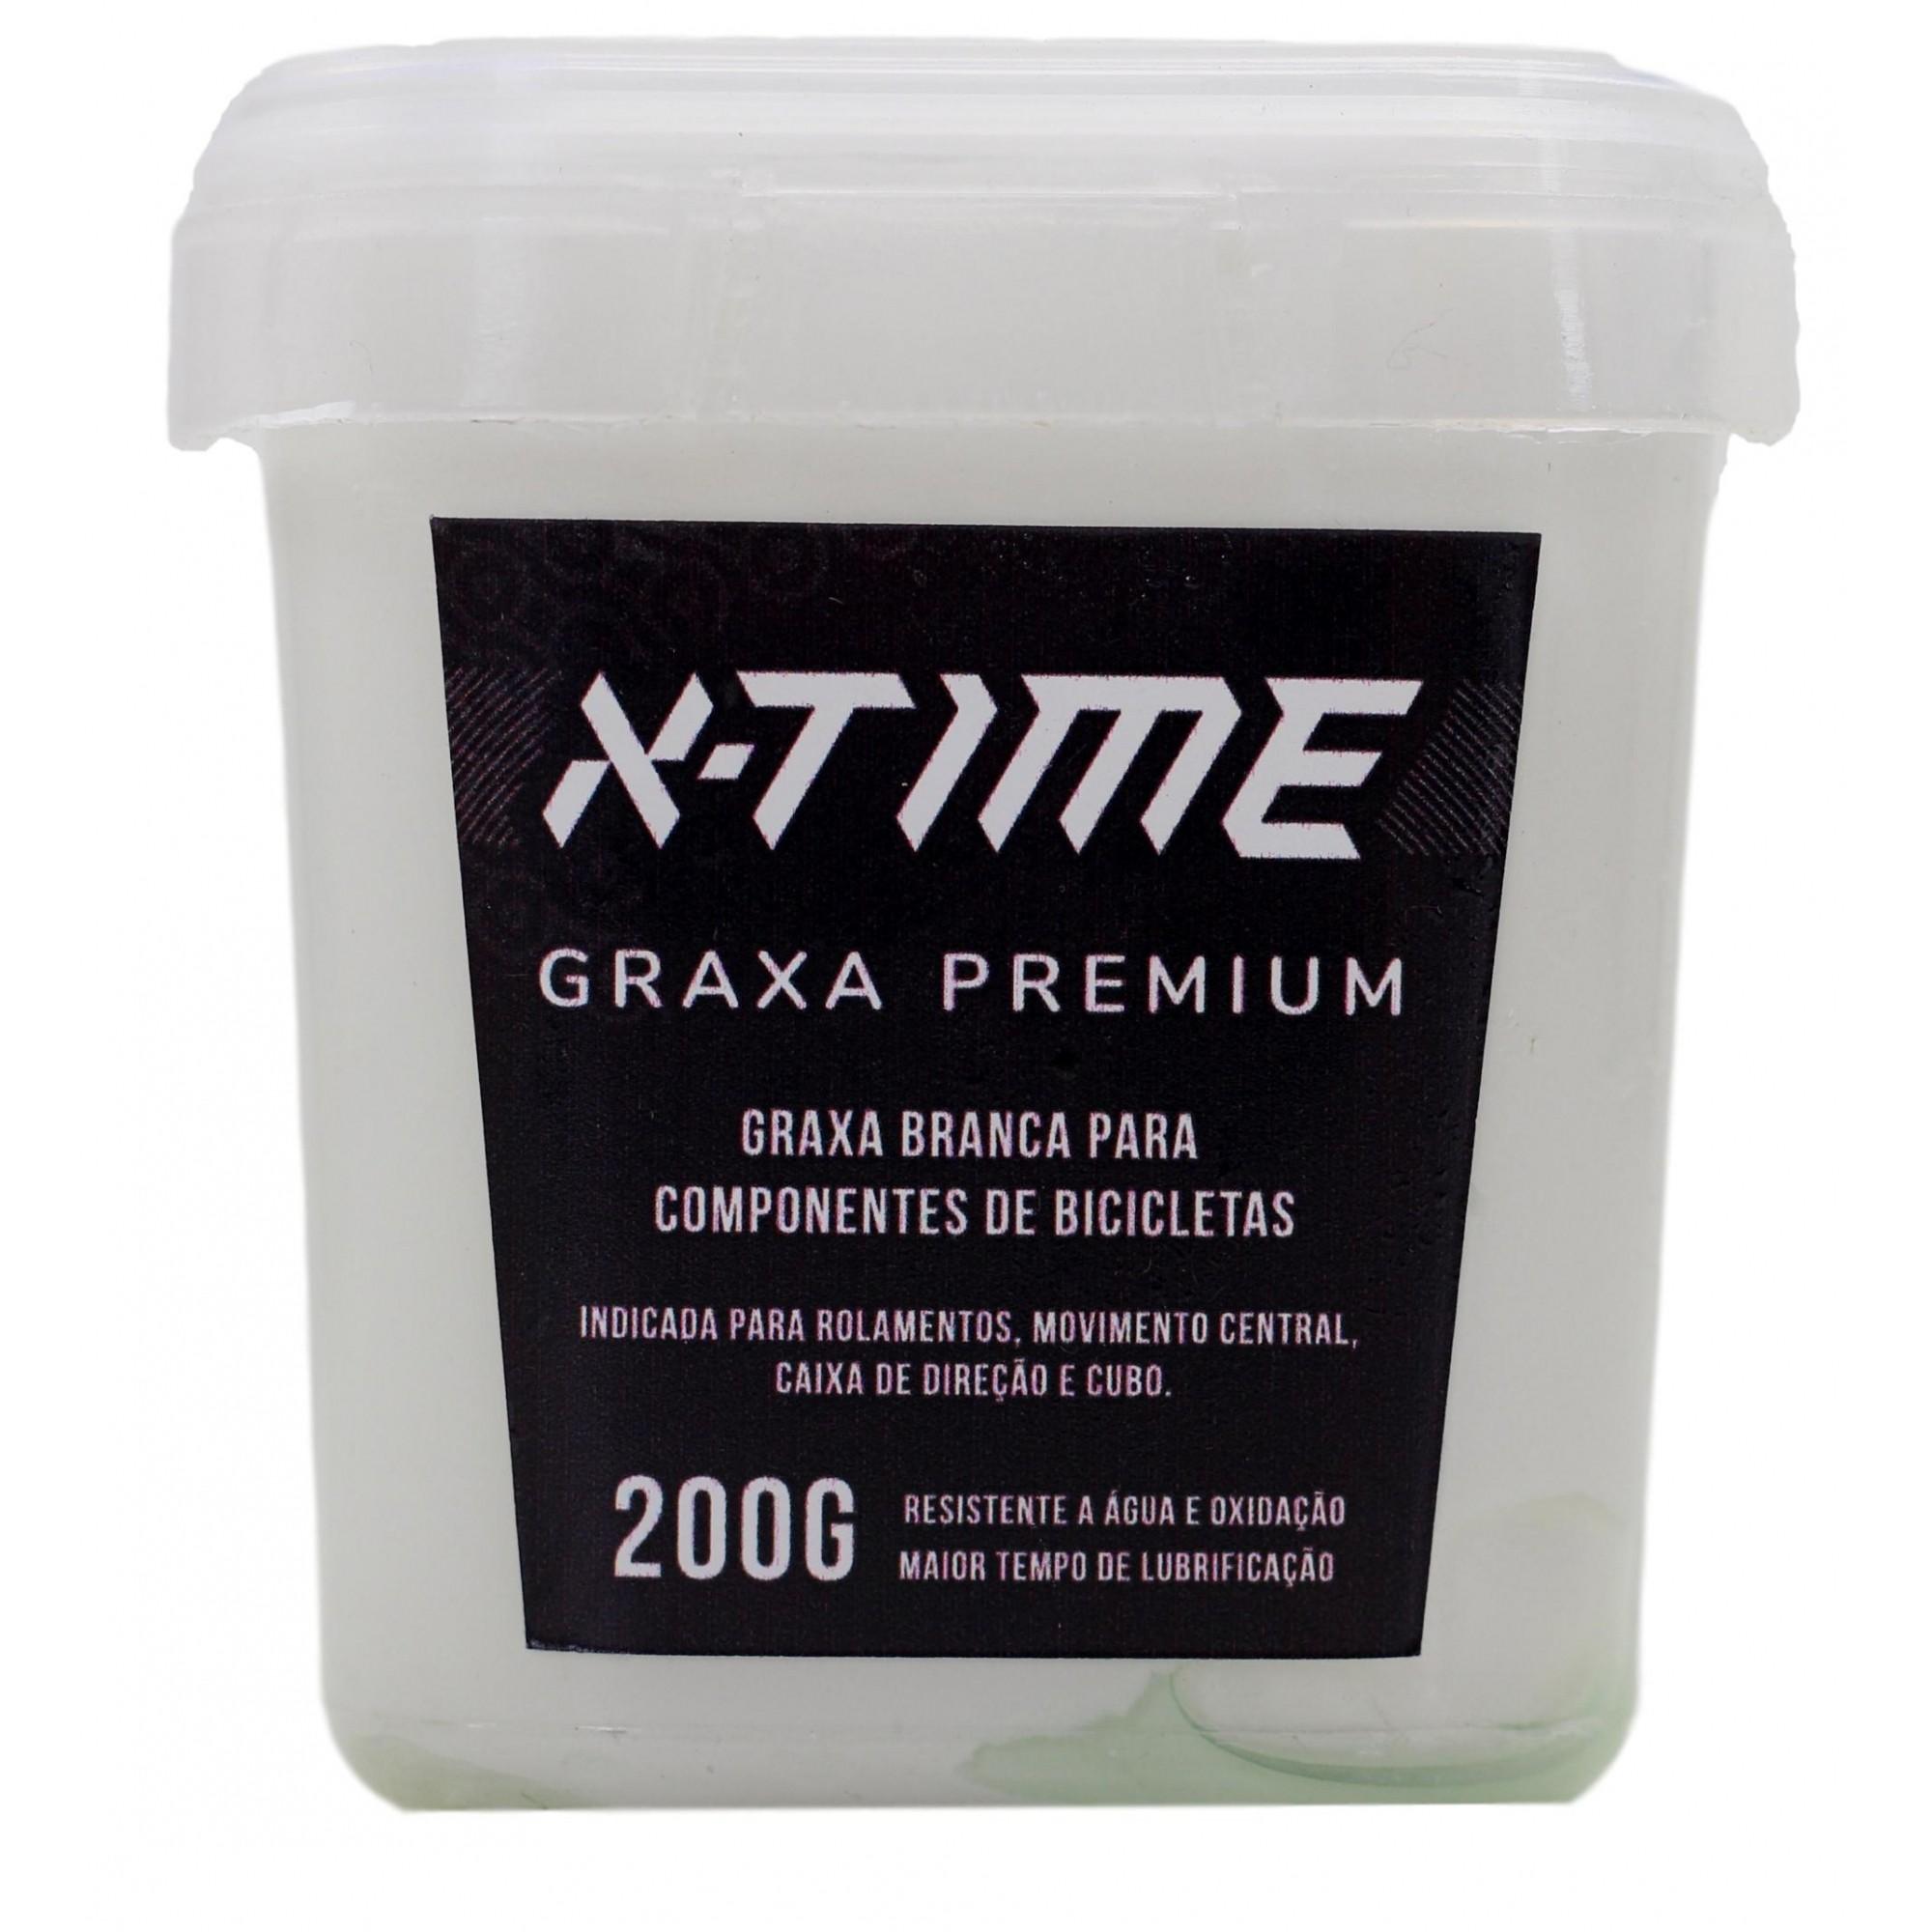 Graxa Branca X-time Premium para Rolamentos Cubos e Partes Bicicletas 200 gramas